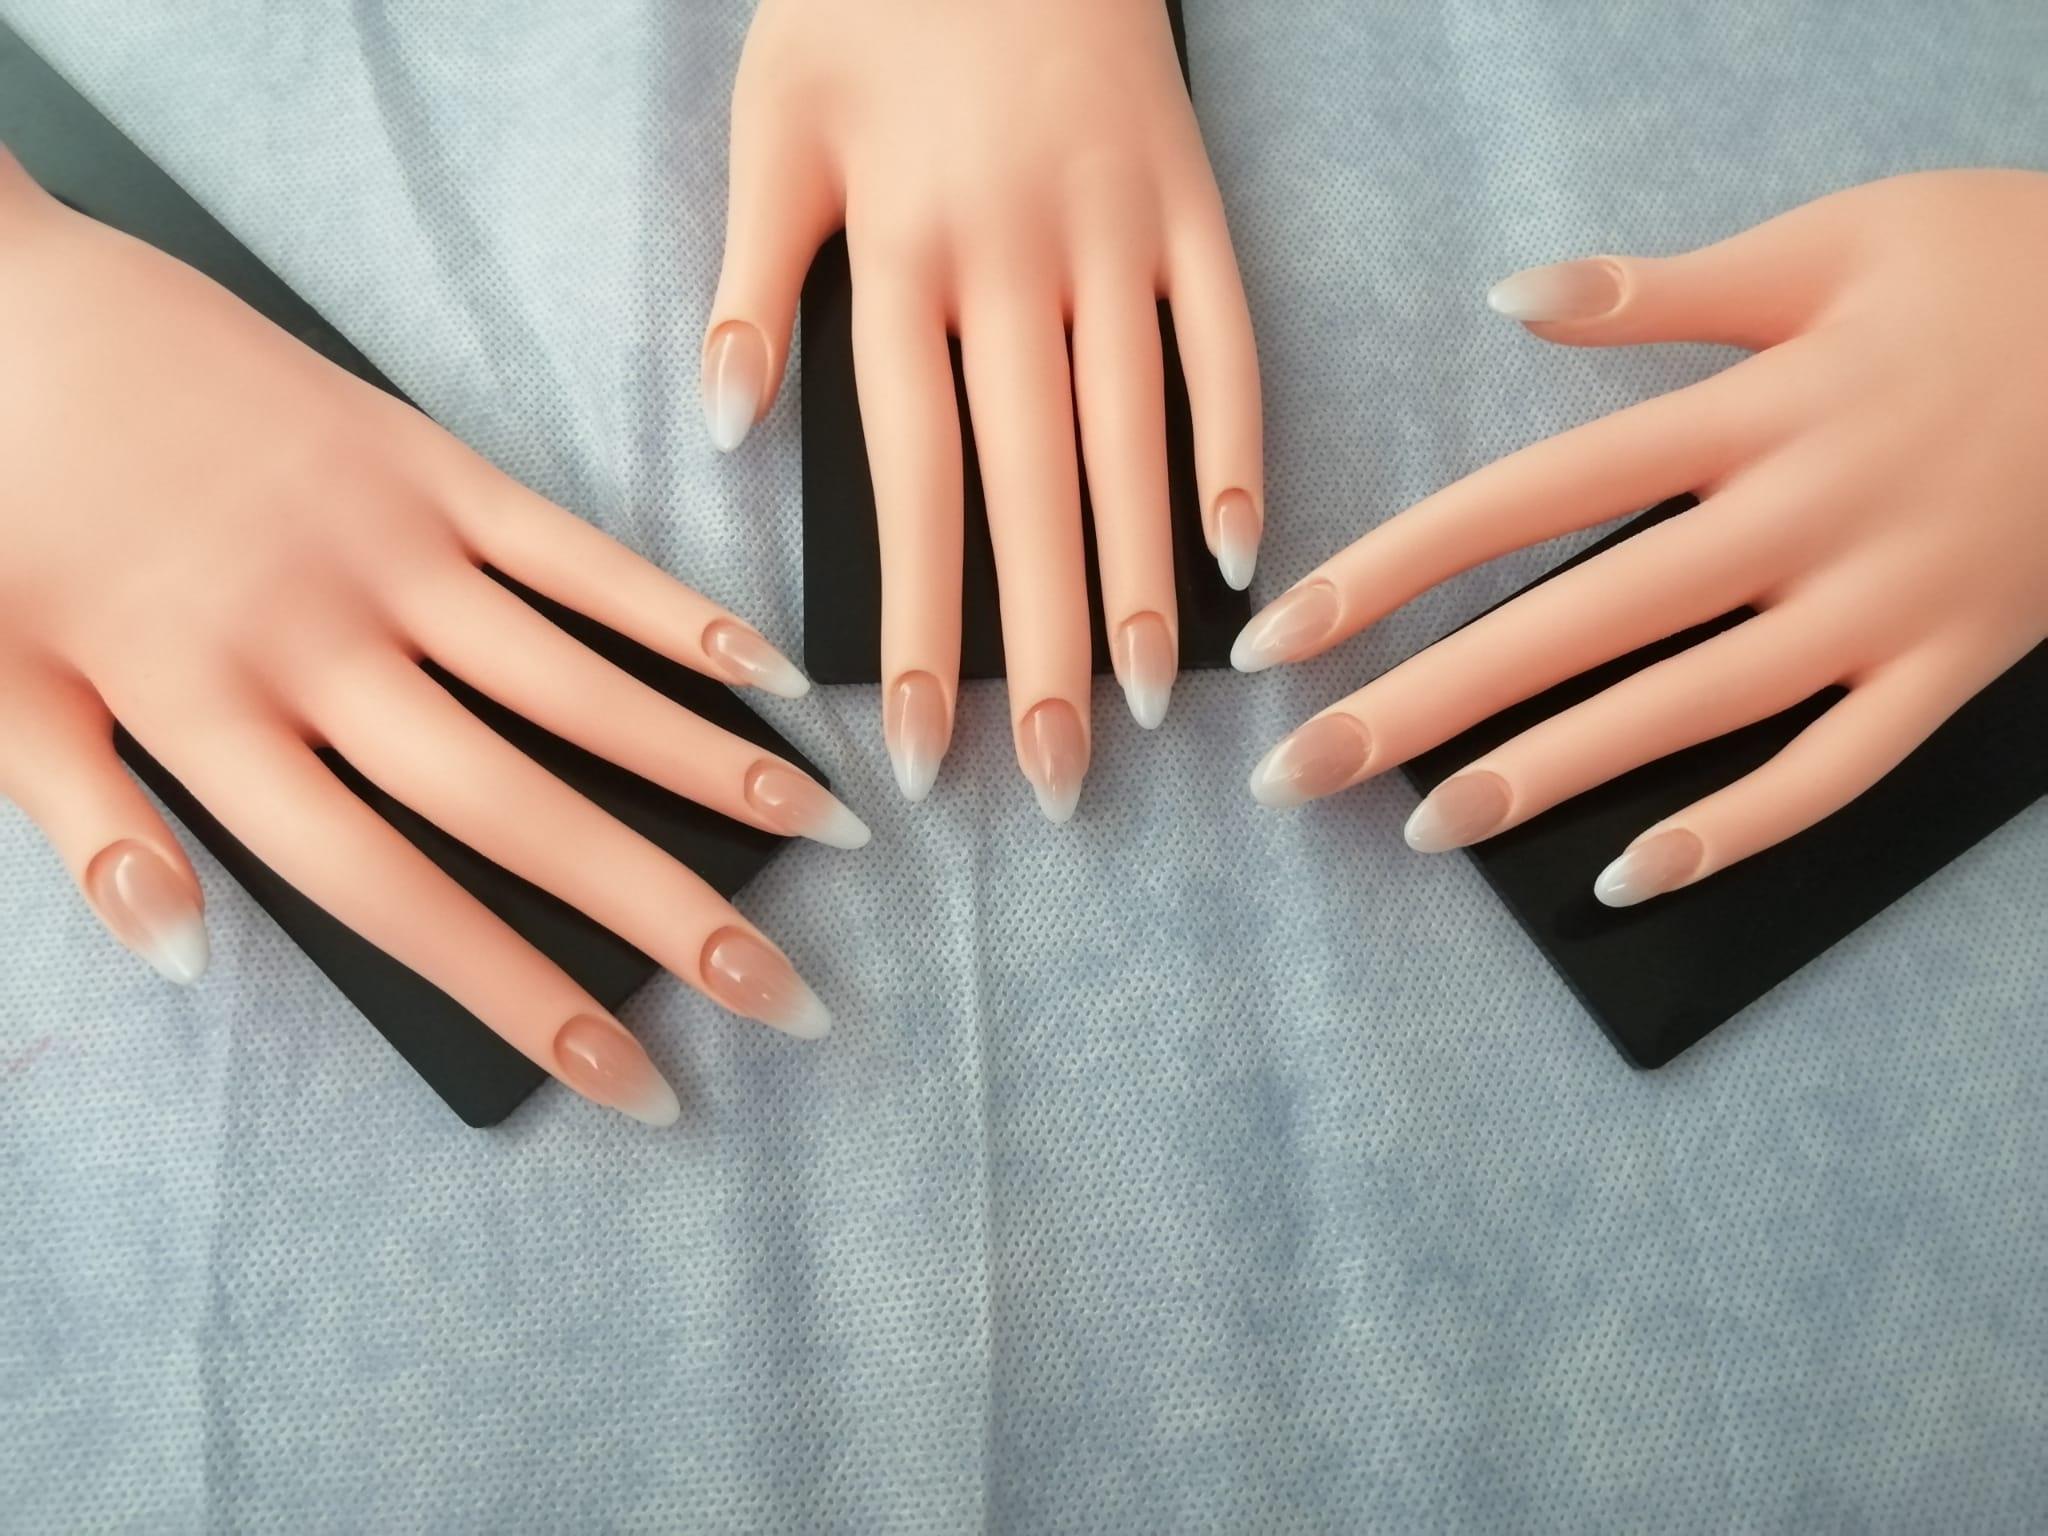 Onicotecnico nail artist 2020 1